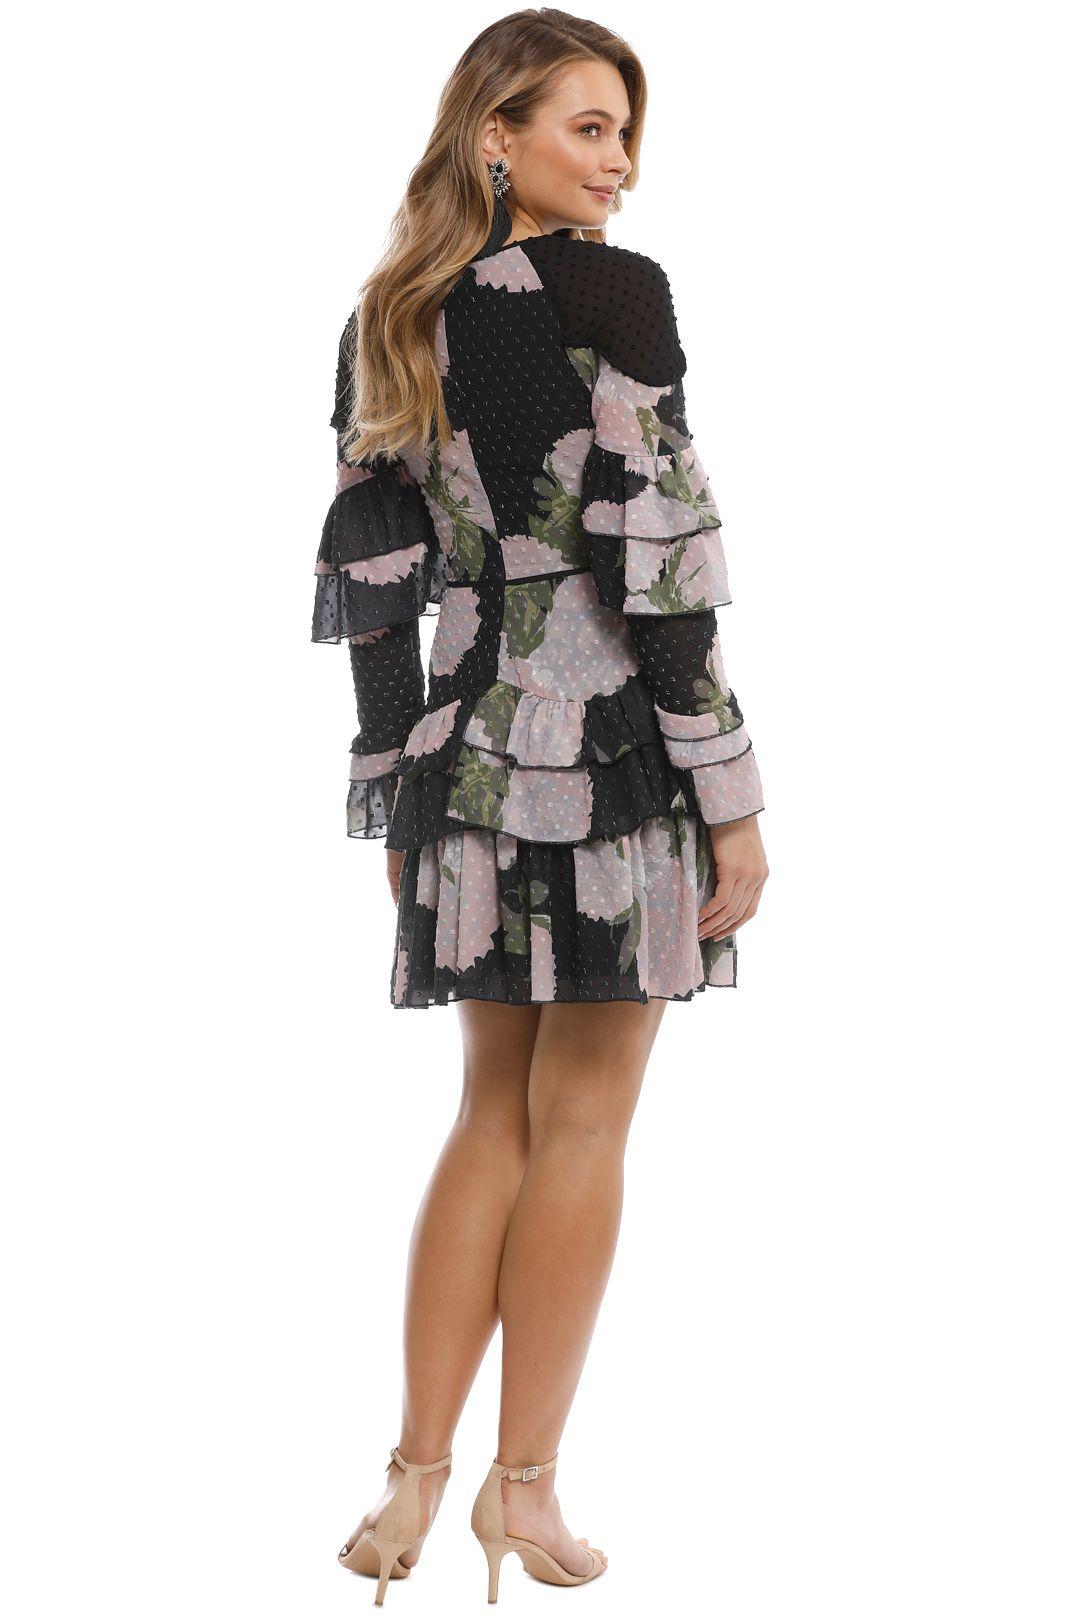 Talulah - New Woman Ruffle Mini Dress - Black Floral - Back